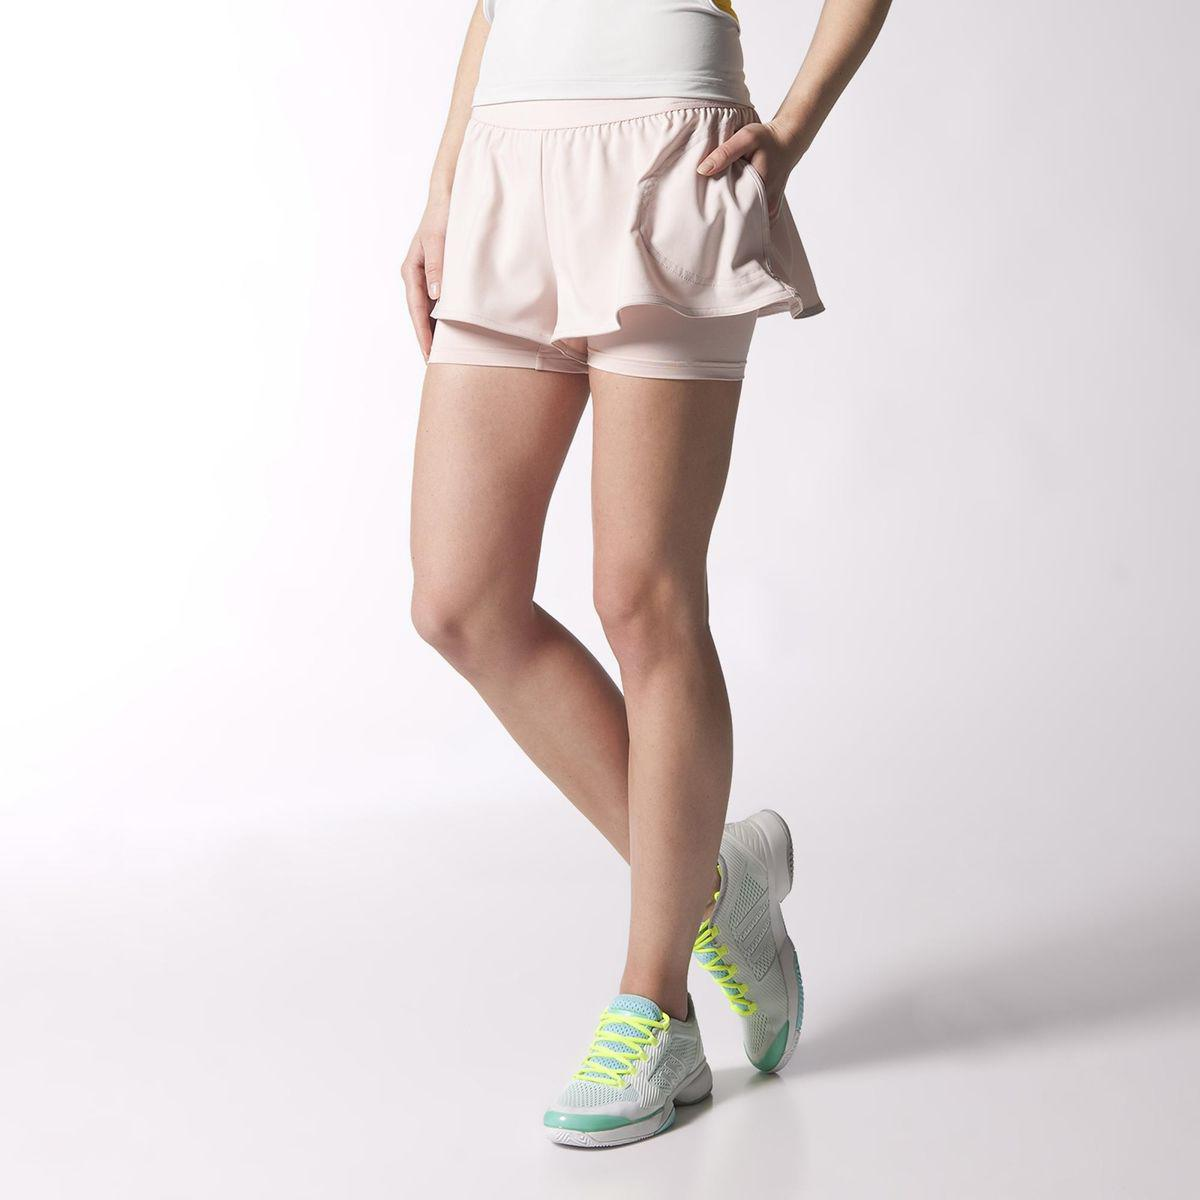 Adidas Womens Stella McCartney Barricade Shorts - Light Pink ... c77584df0f